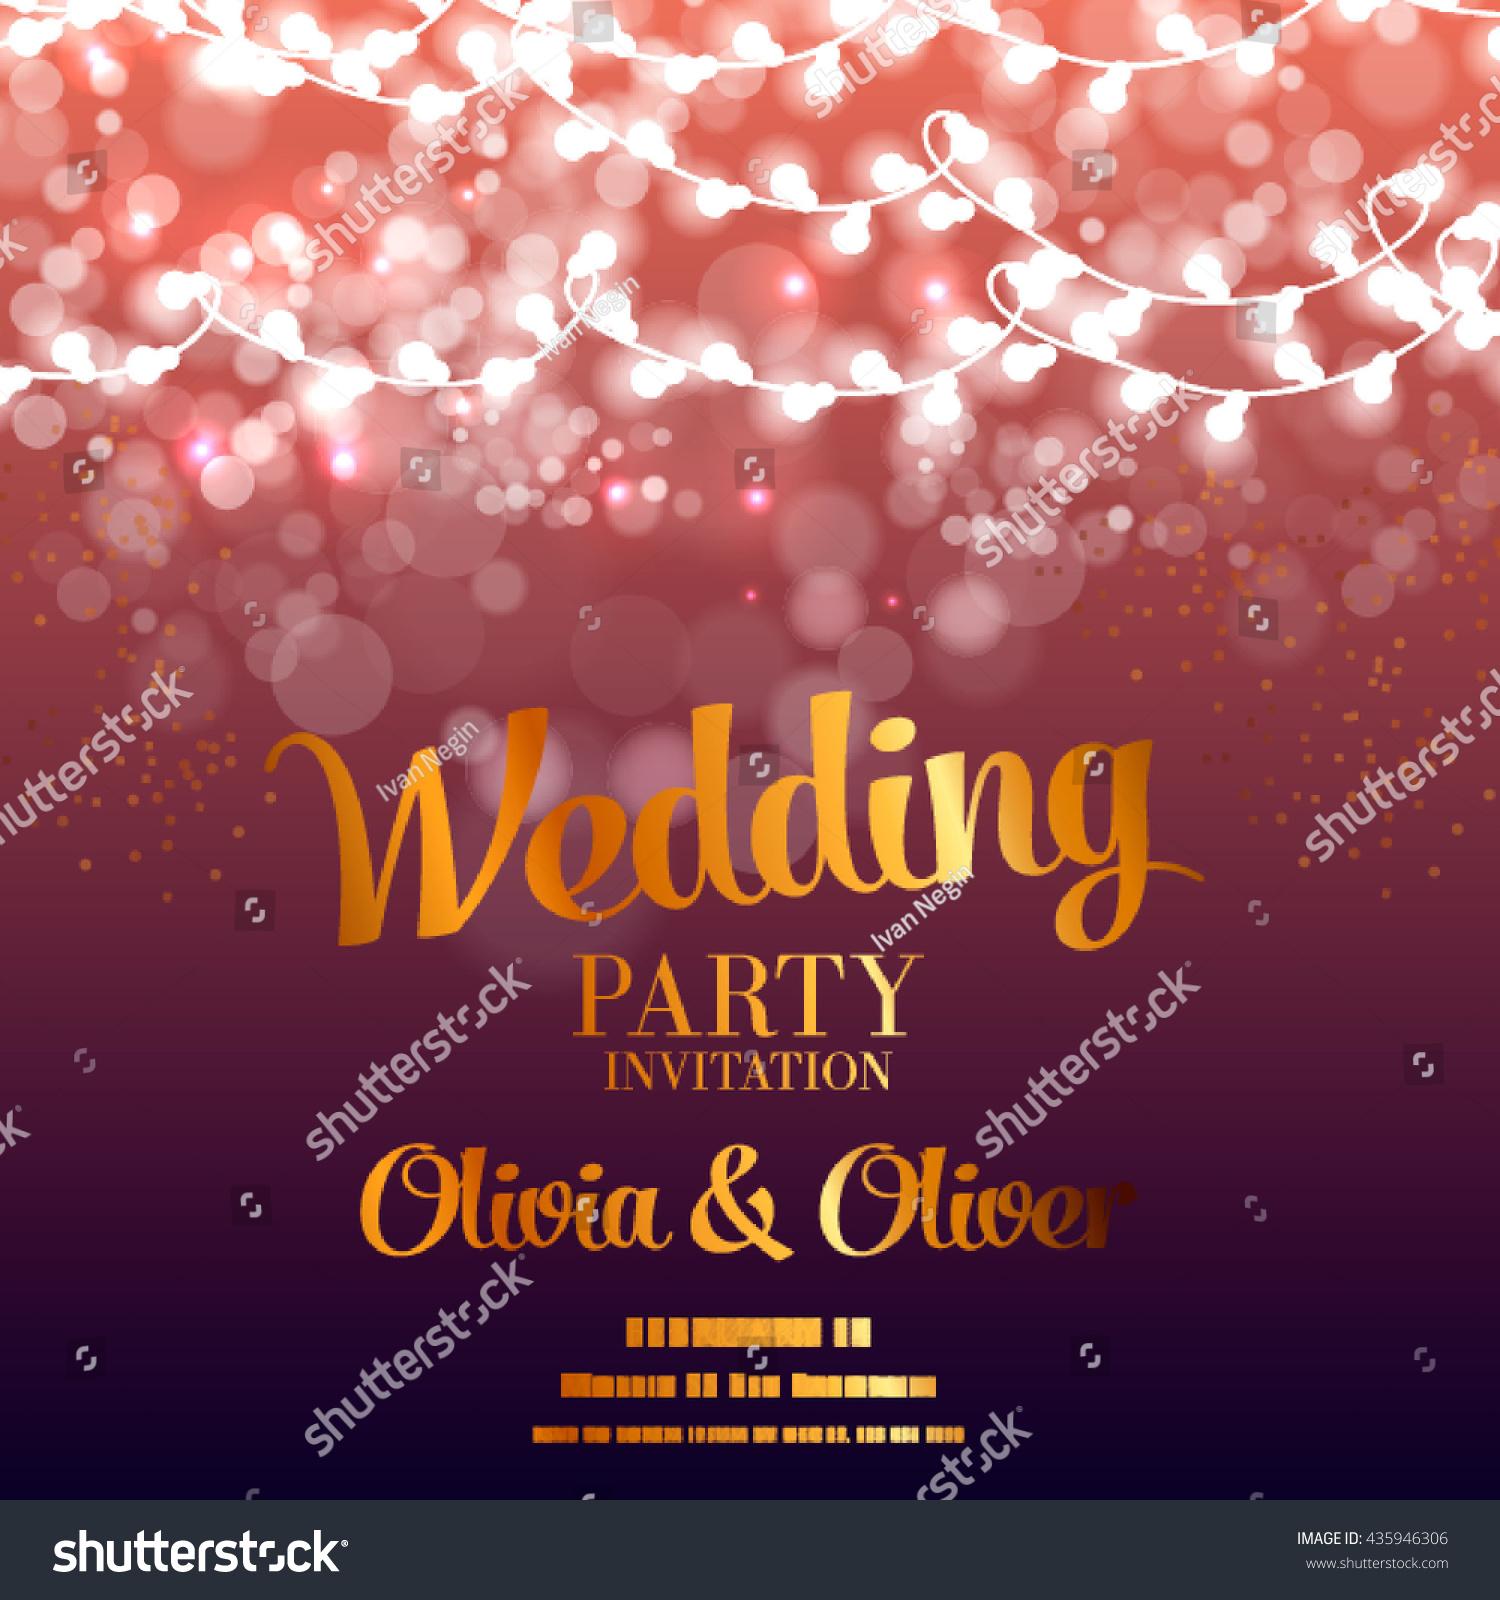 Wedding Invitation Glowing Light Garden Party Stock Vector HD ...